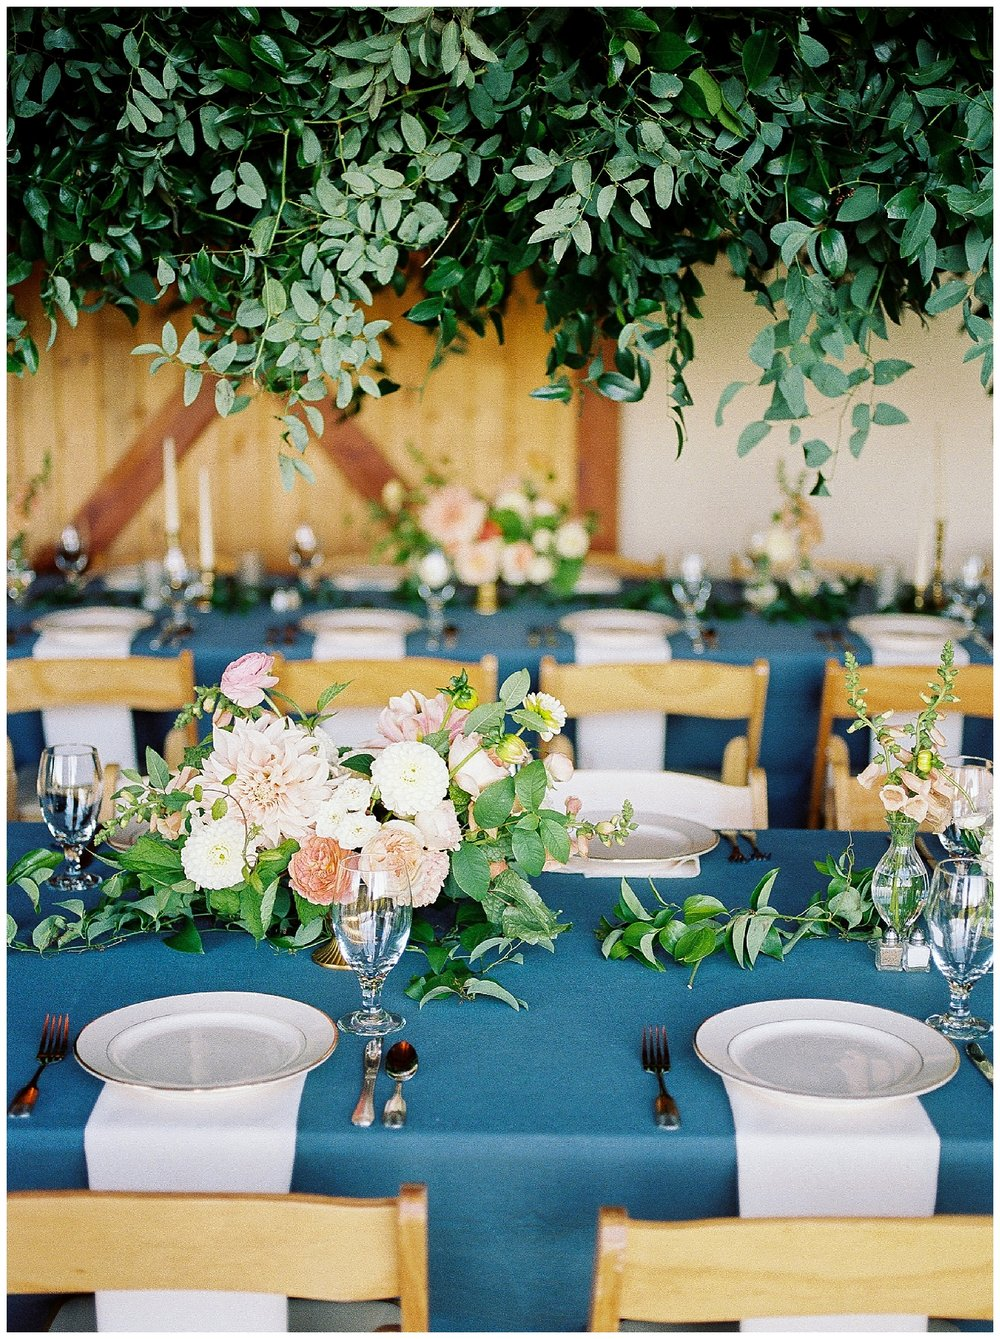 Best_Portland_Wedding_Florist_and_Design6.jpg